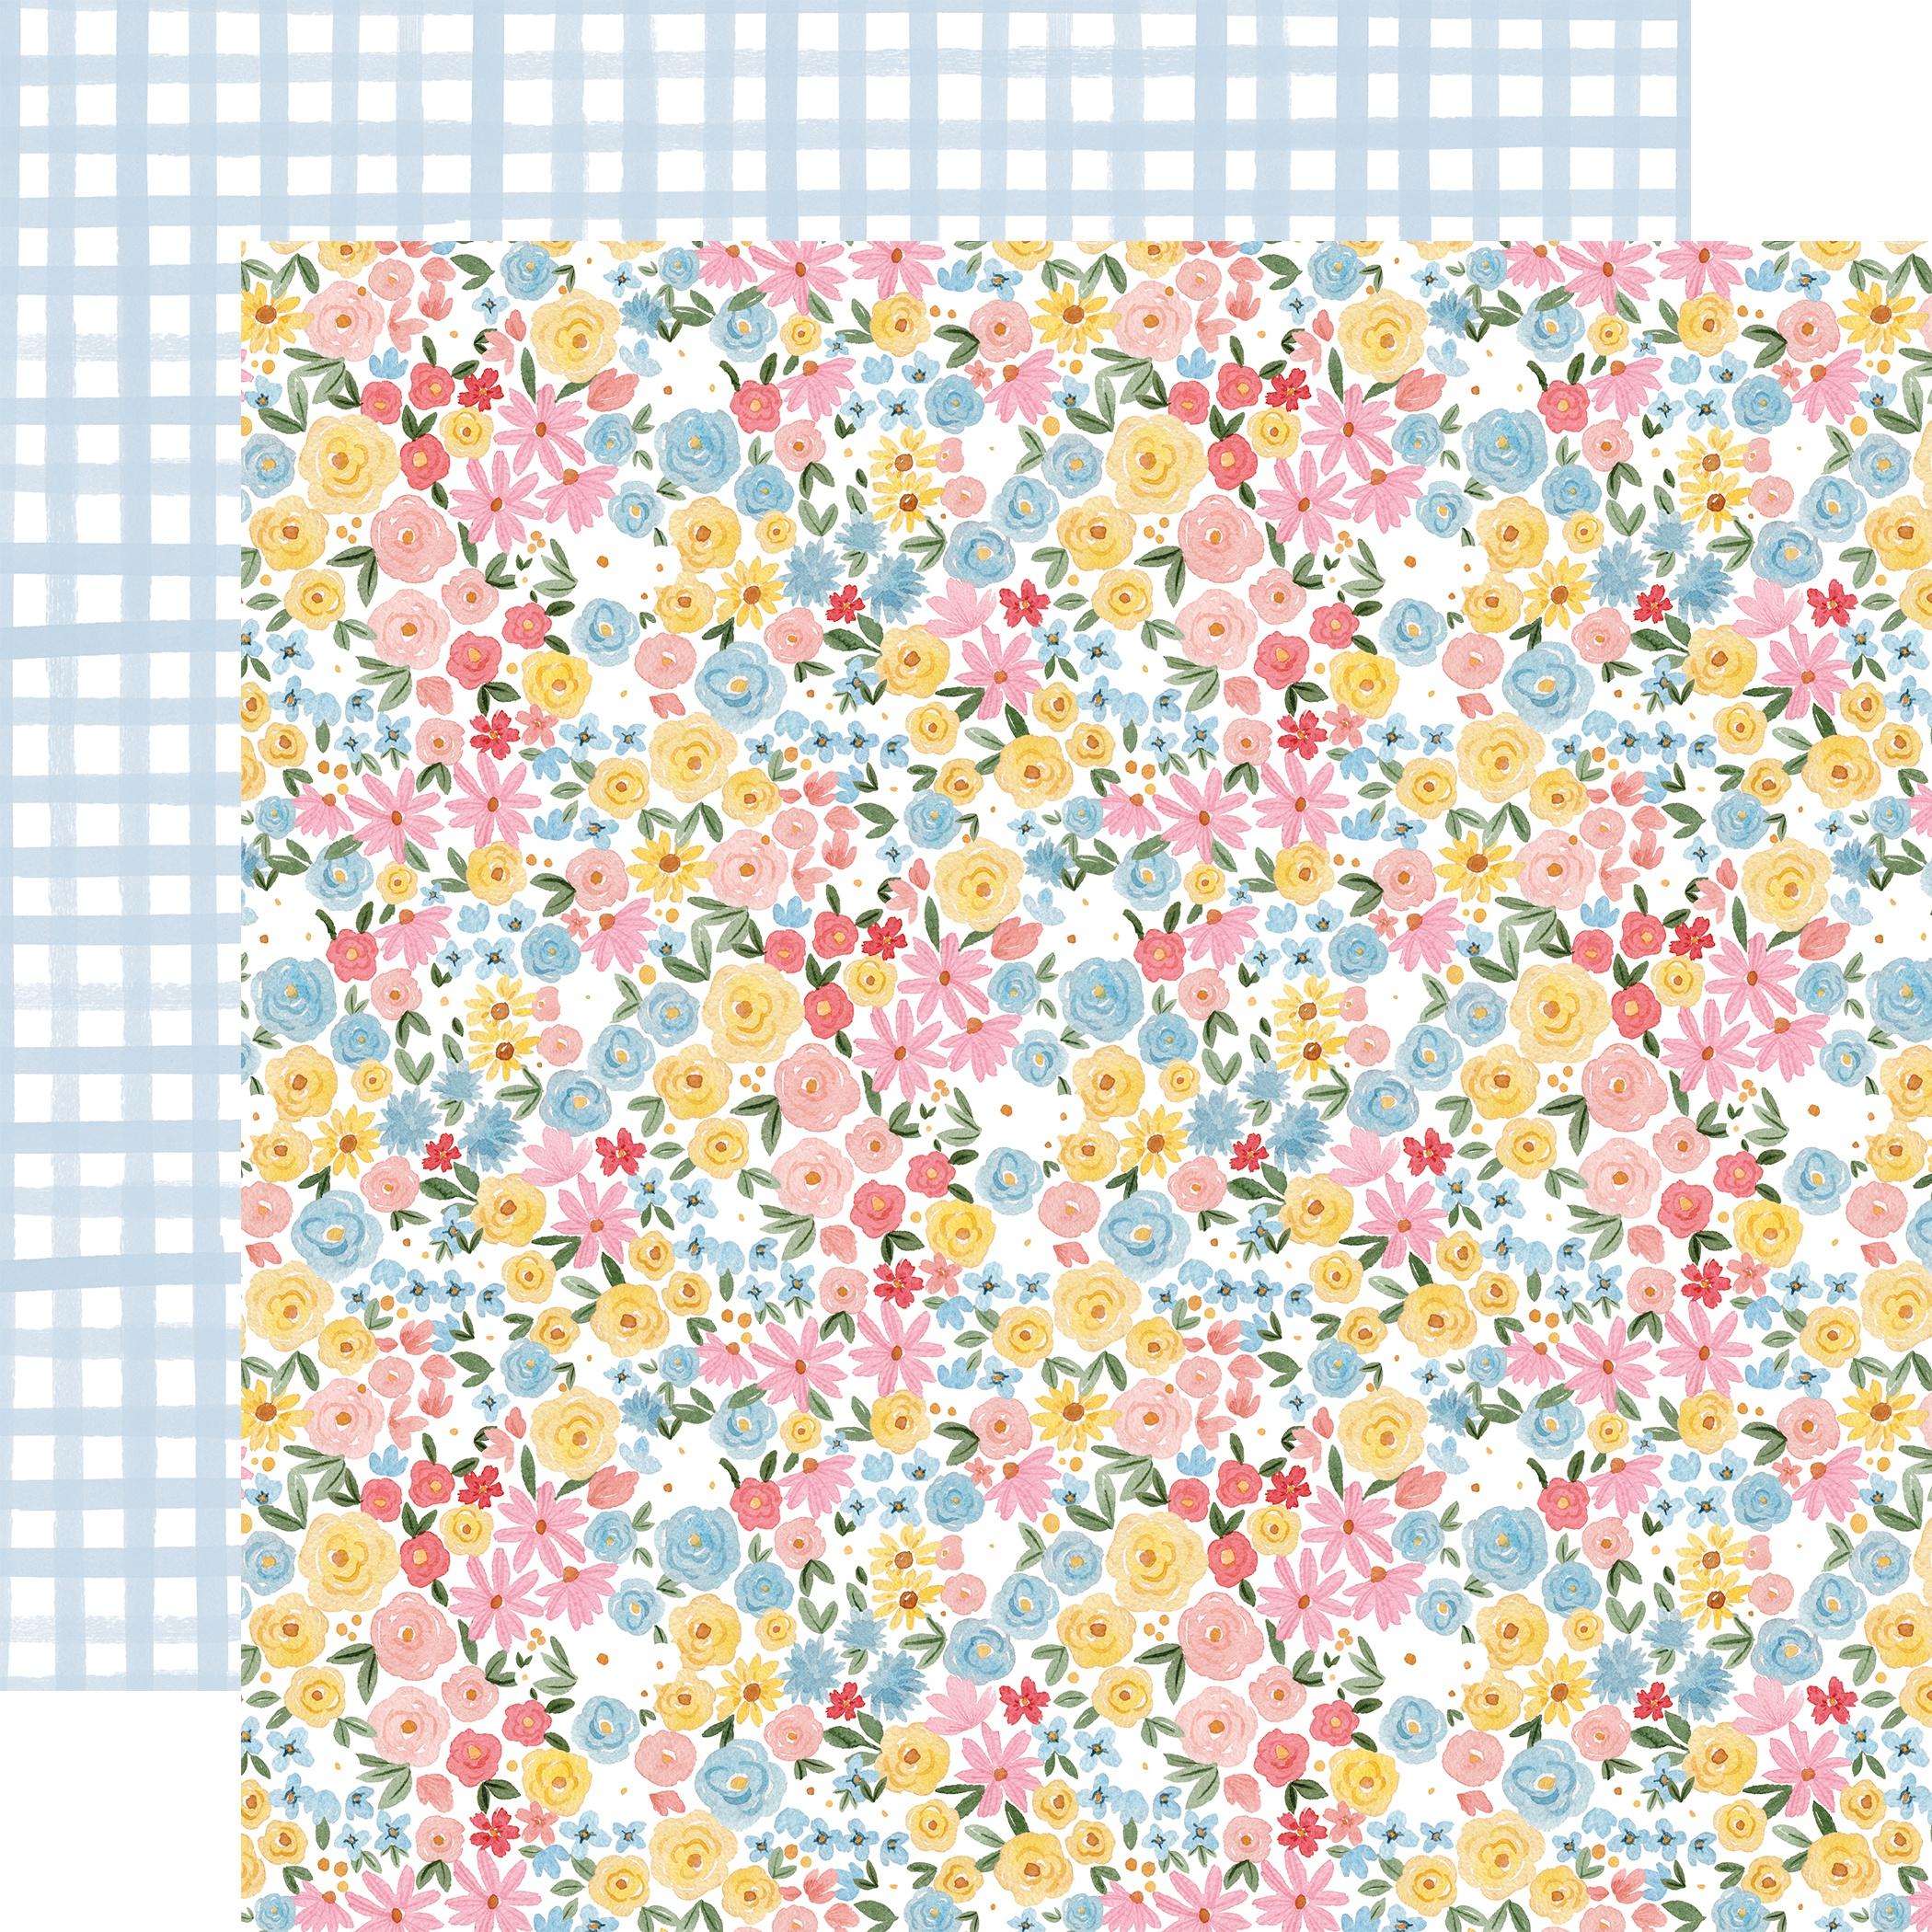 Carta Bella - Summer - BLOOM & GROW - 12x12 Double-Sided Textured Cardstock